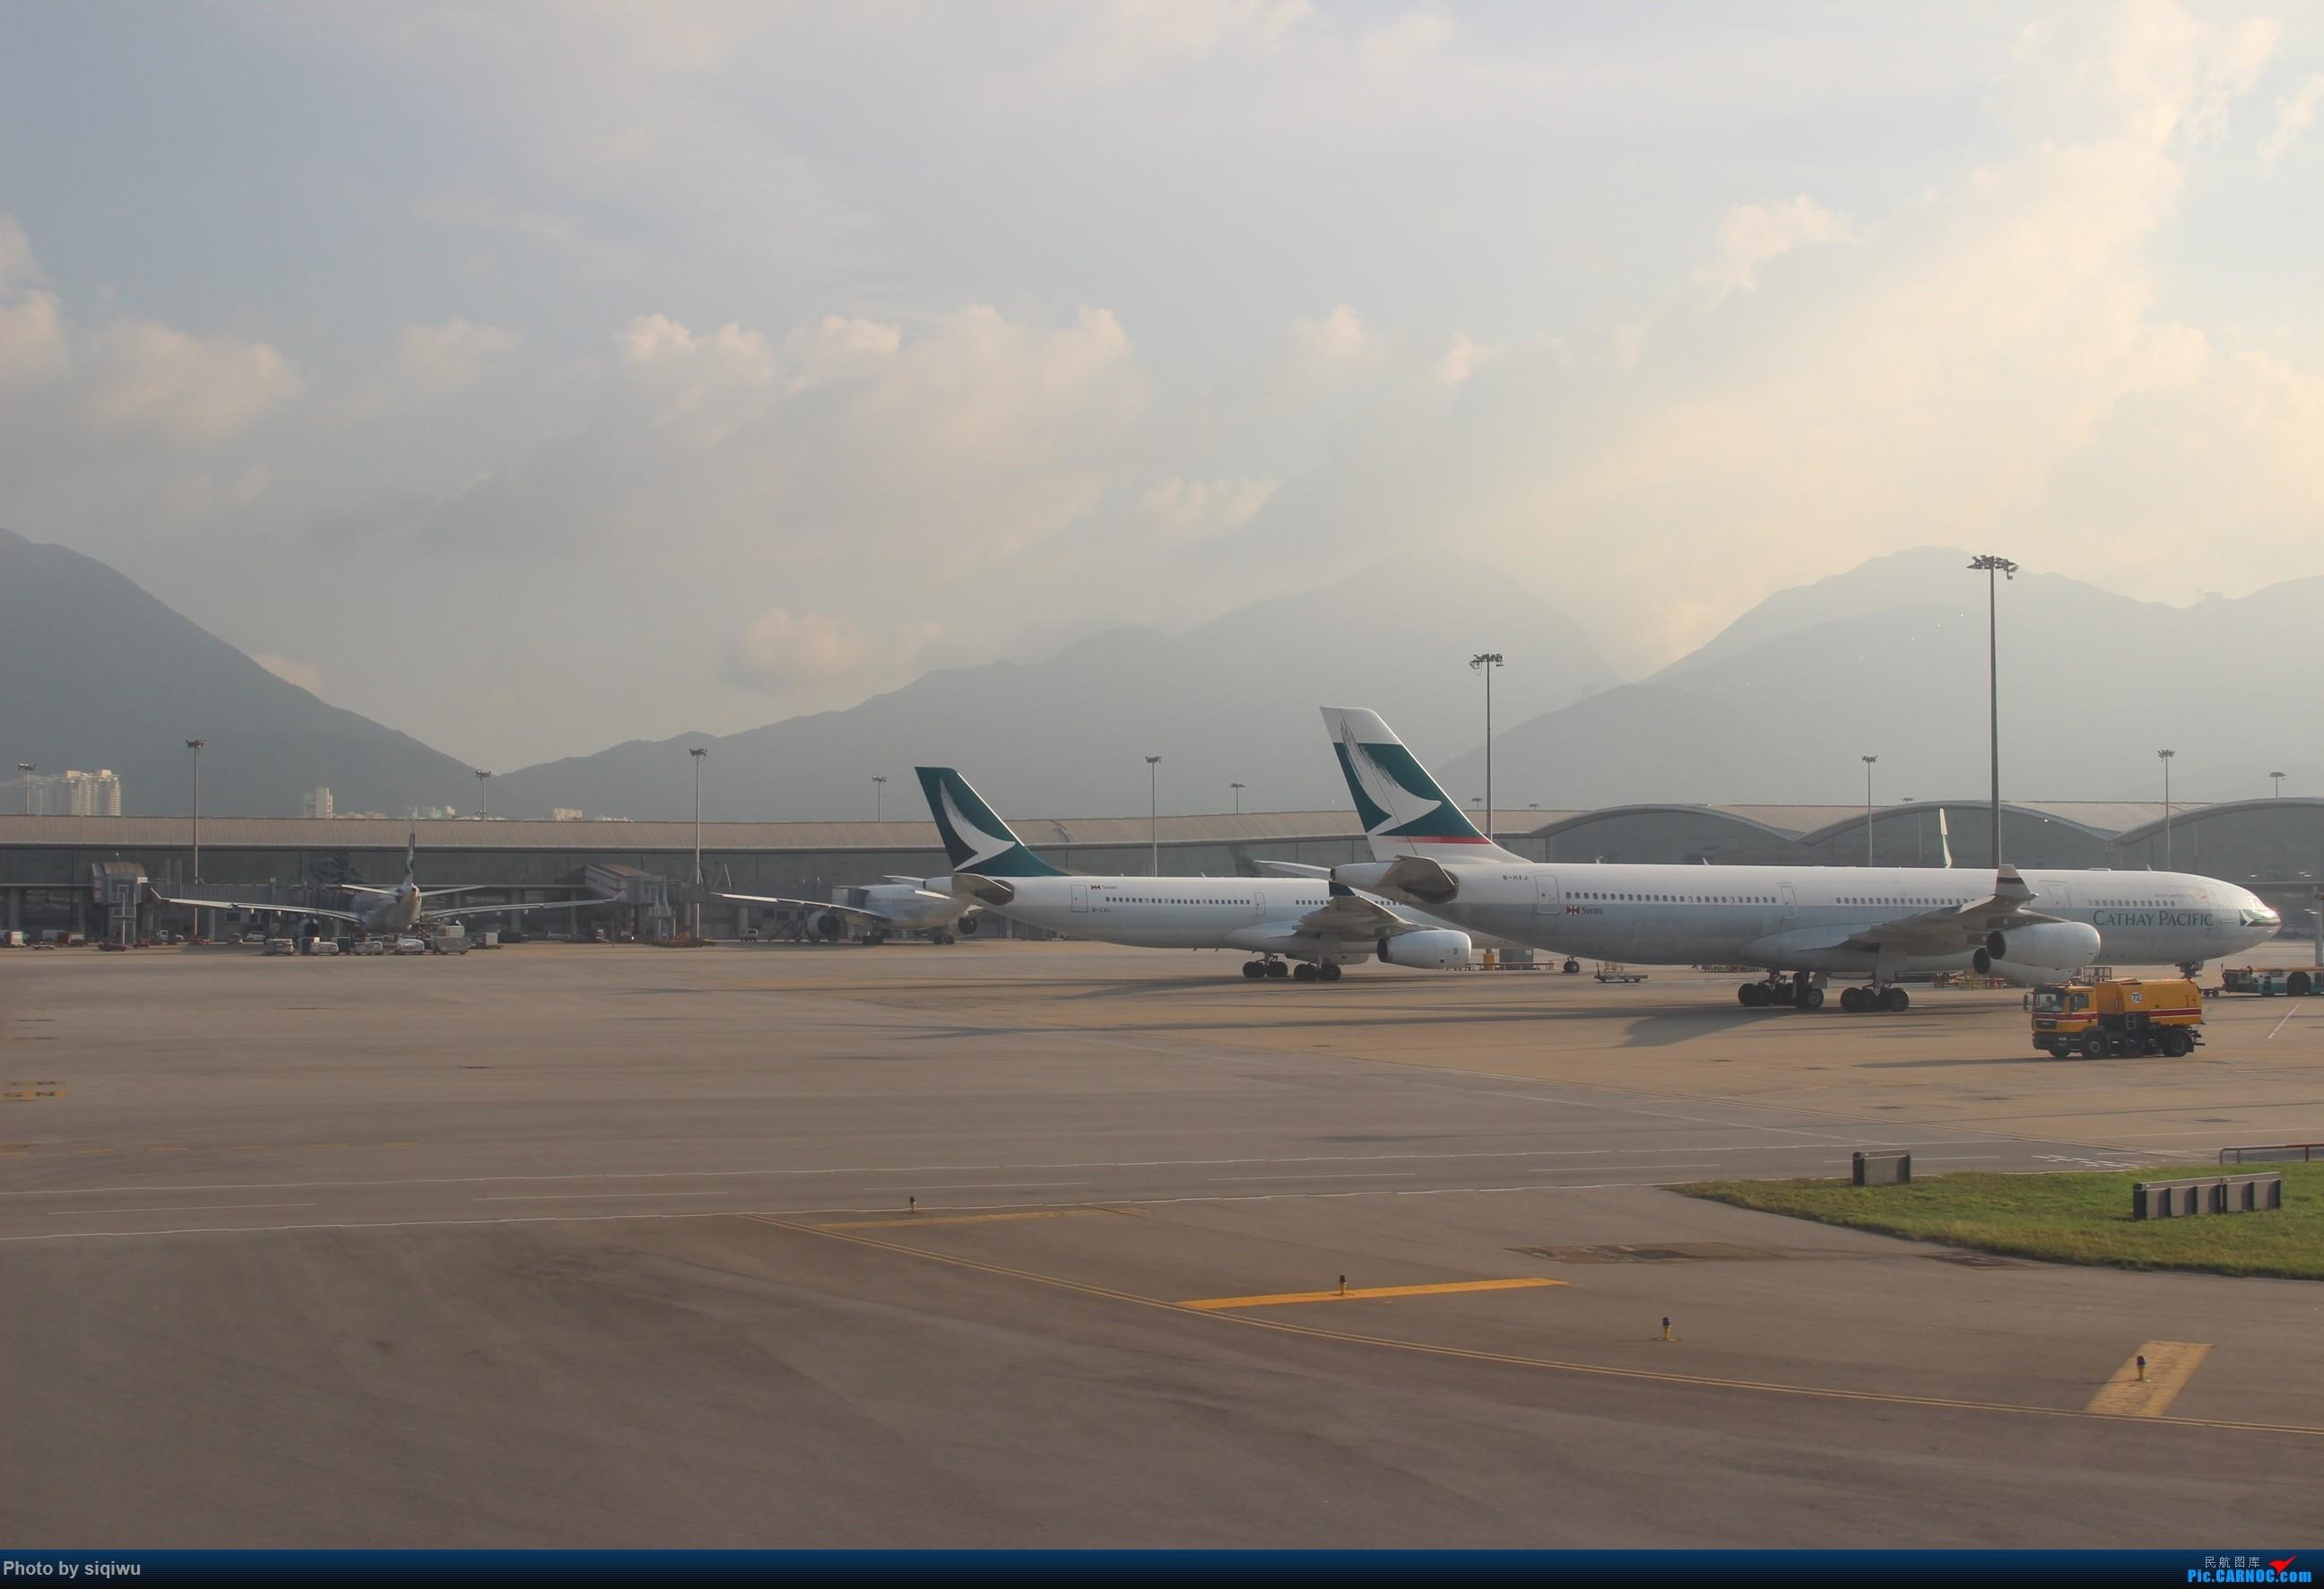 Re:[原创]PVG-HKG-KUL-HKG-PVG 四天往返,CX/KA    中国香港国际机场